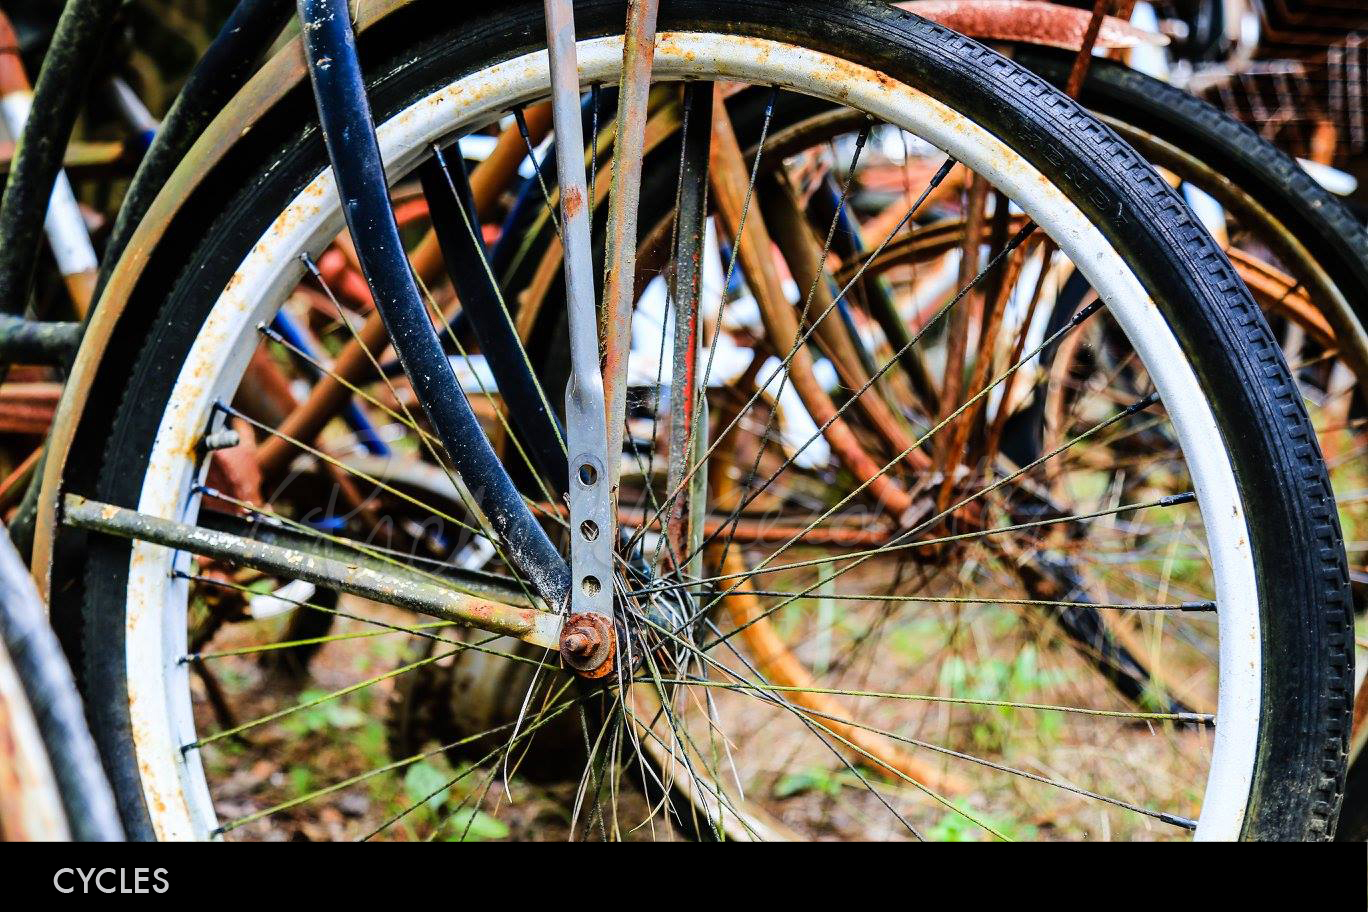 Cycles2.jpg